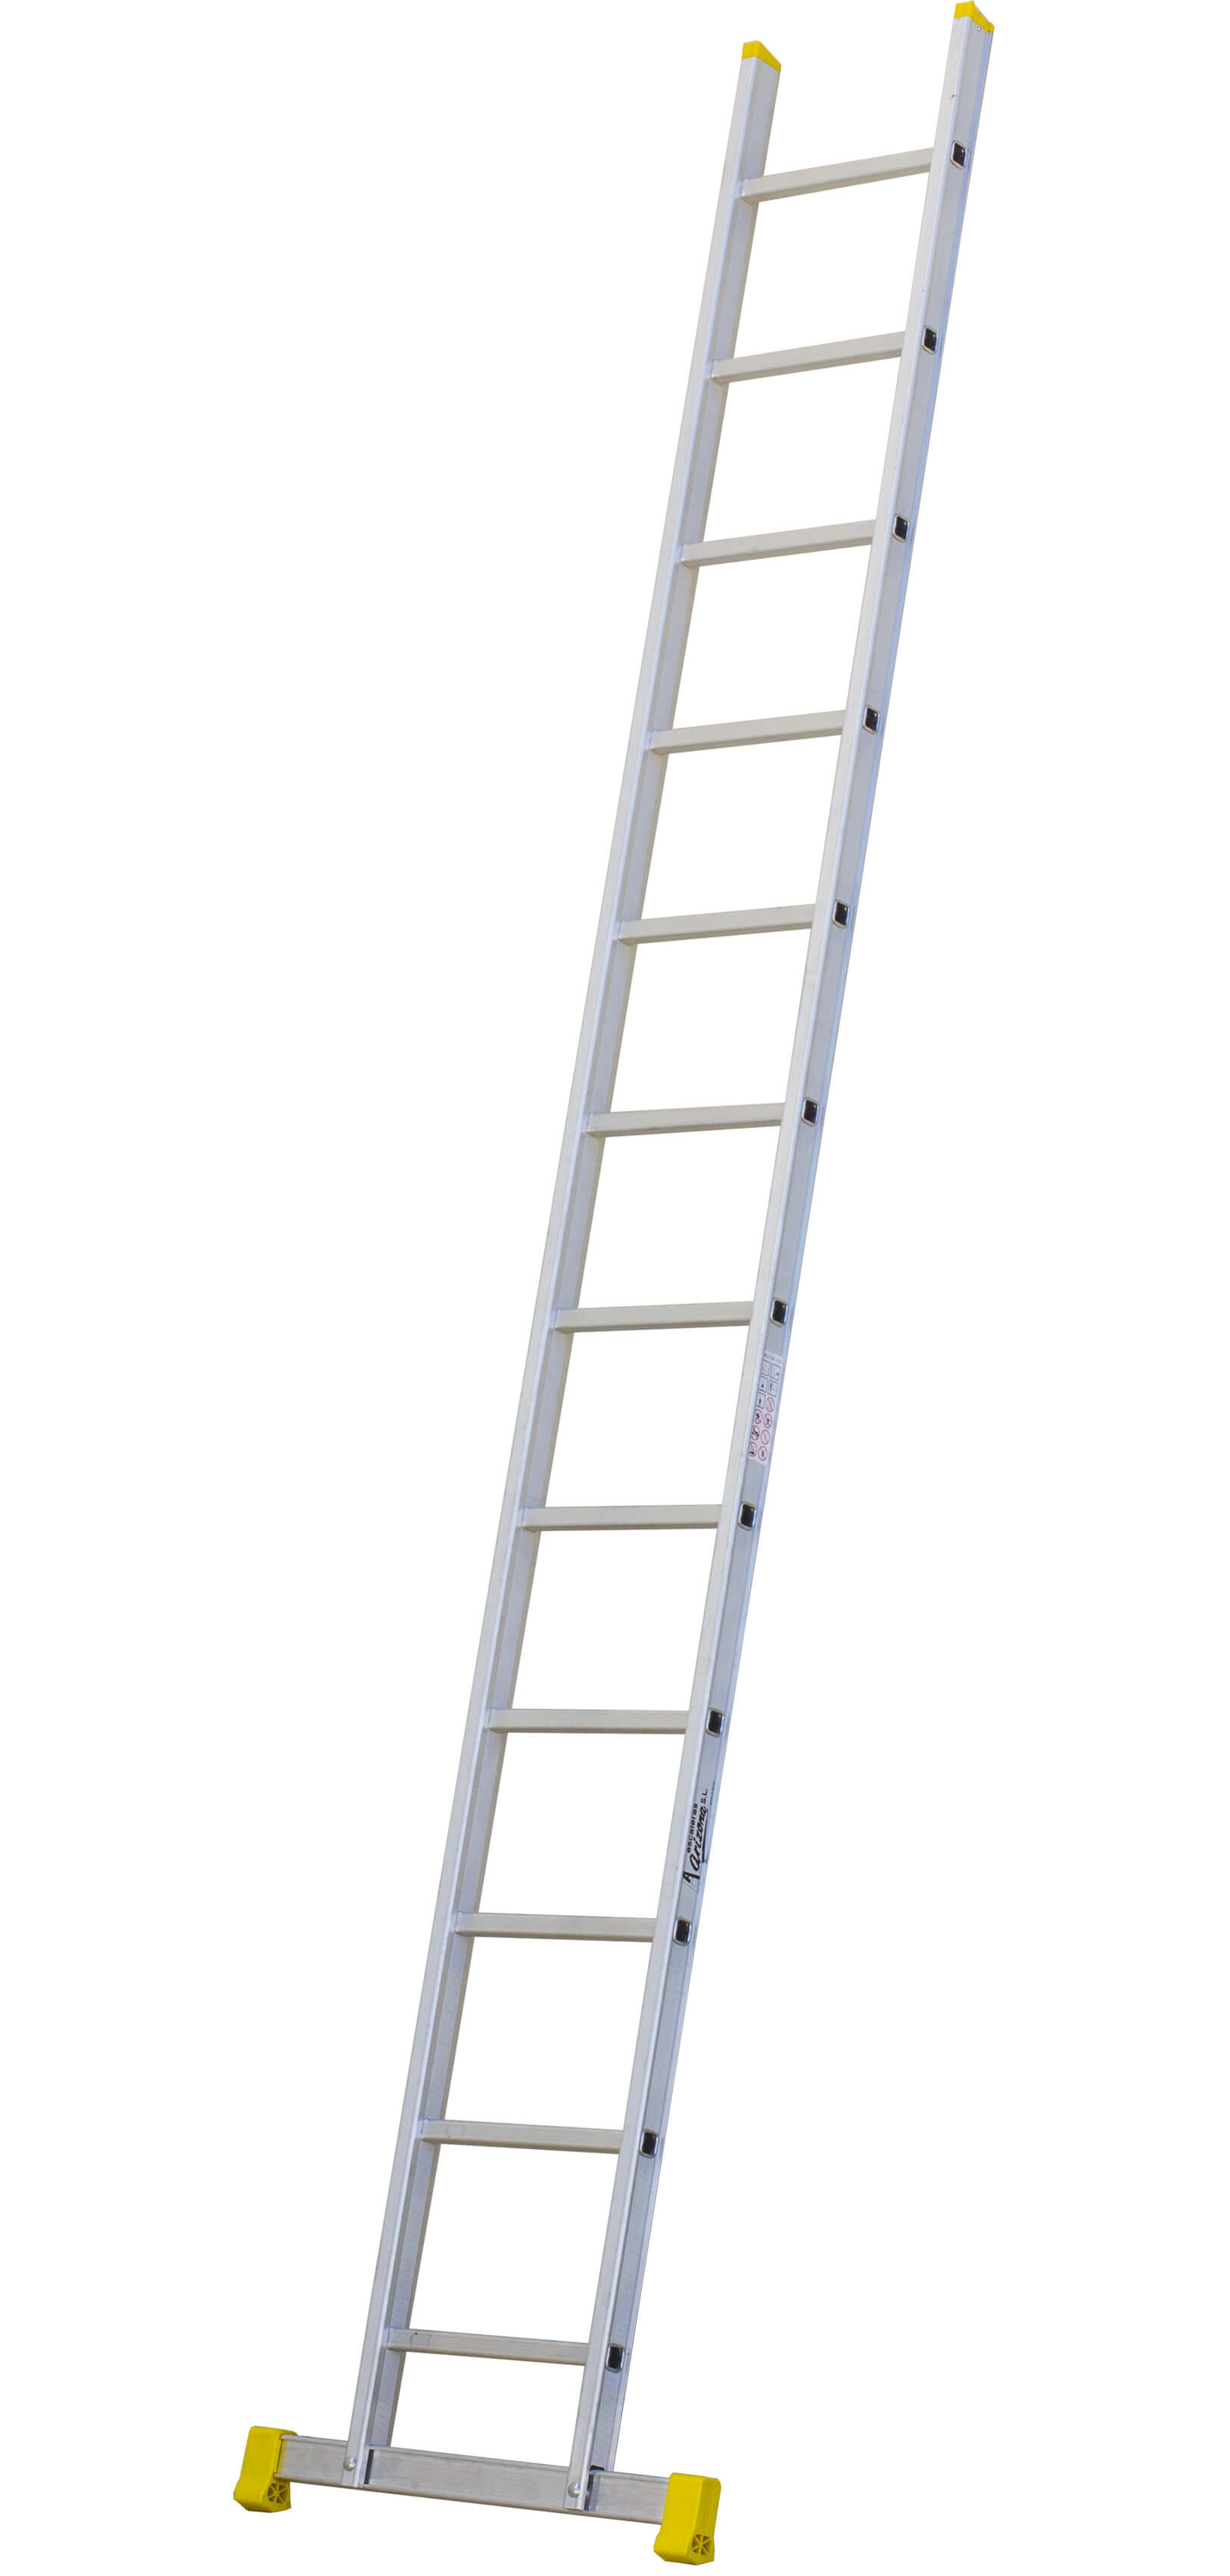 Escalera de aluminio de un tramo escaleras arizona for Precio de escalera extensible de aluminio